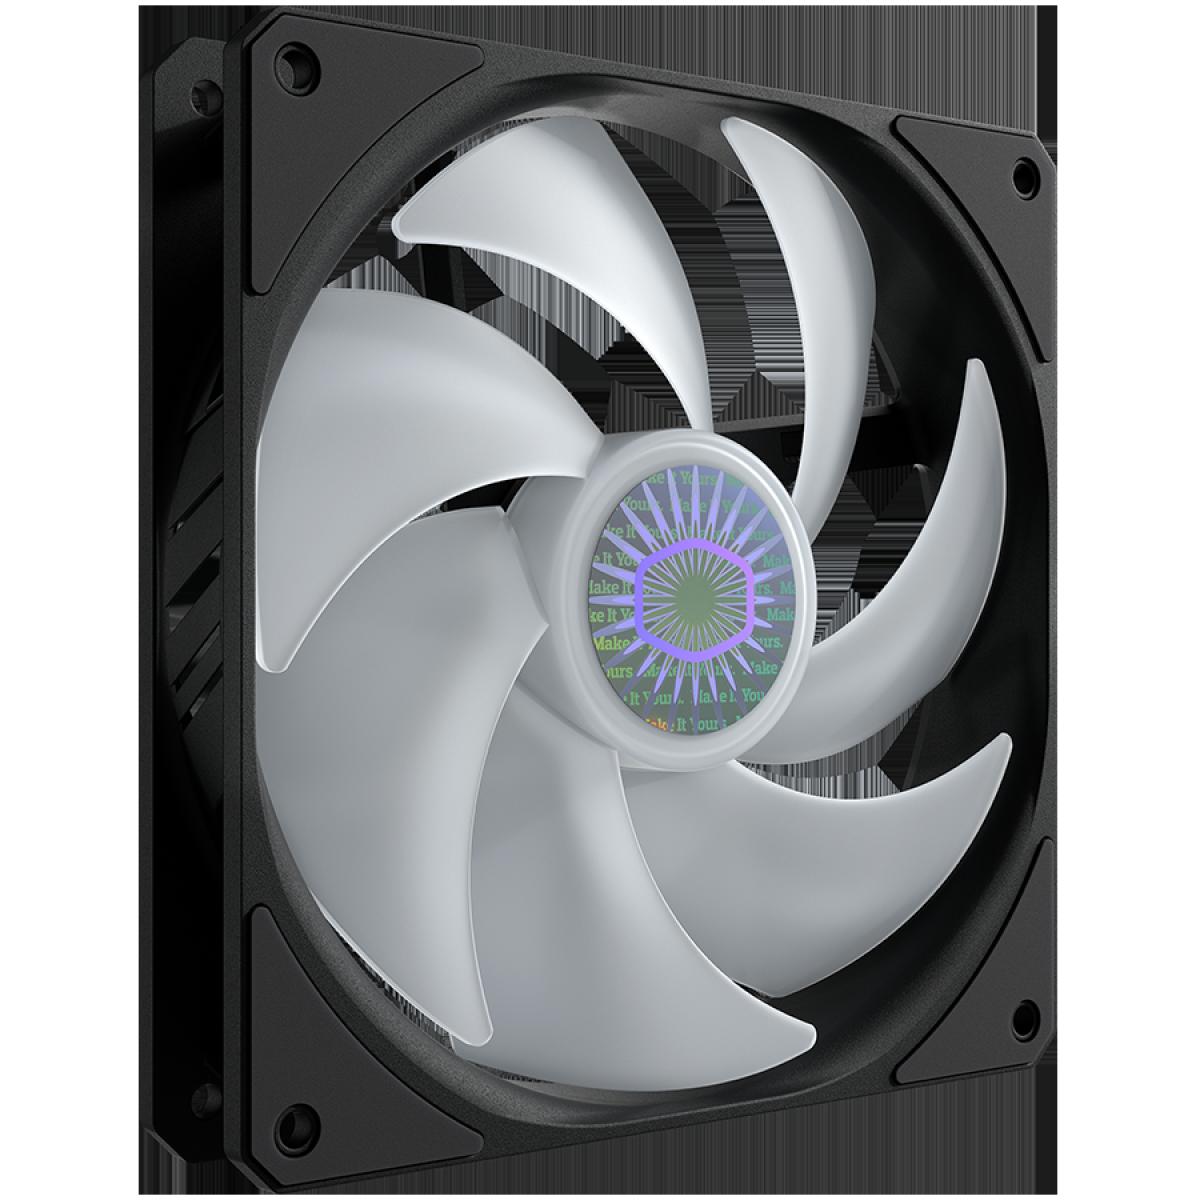 Cooler para Gabinete, Cooler Master, SickleFlow MF140, ARGB, 140mm, 1800RPM,  MFX-B4DN-14NPA-R1